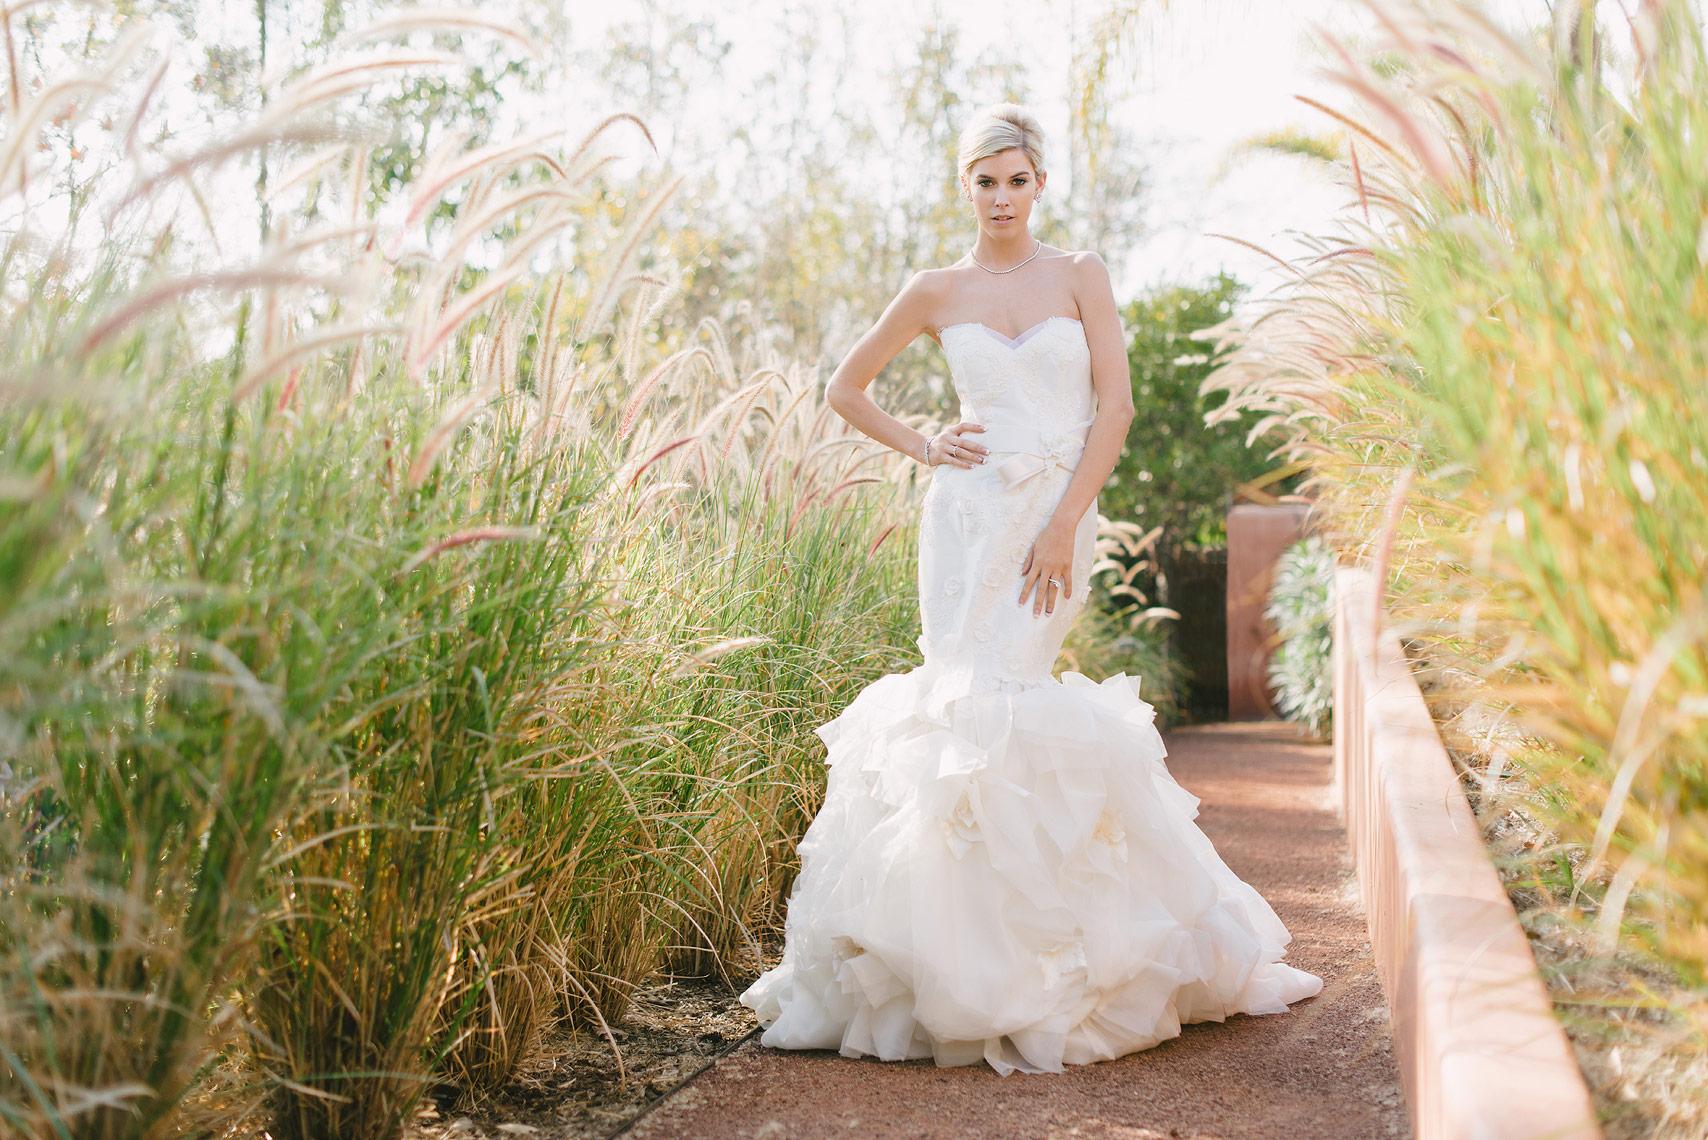 11-wedding-gown-inspiration.jpg